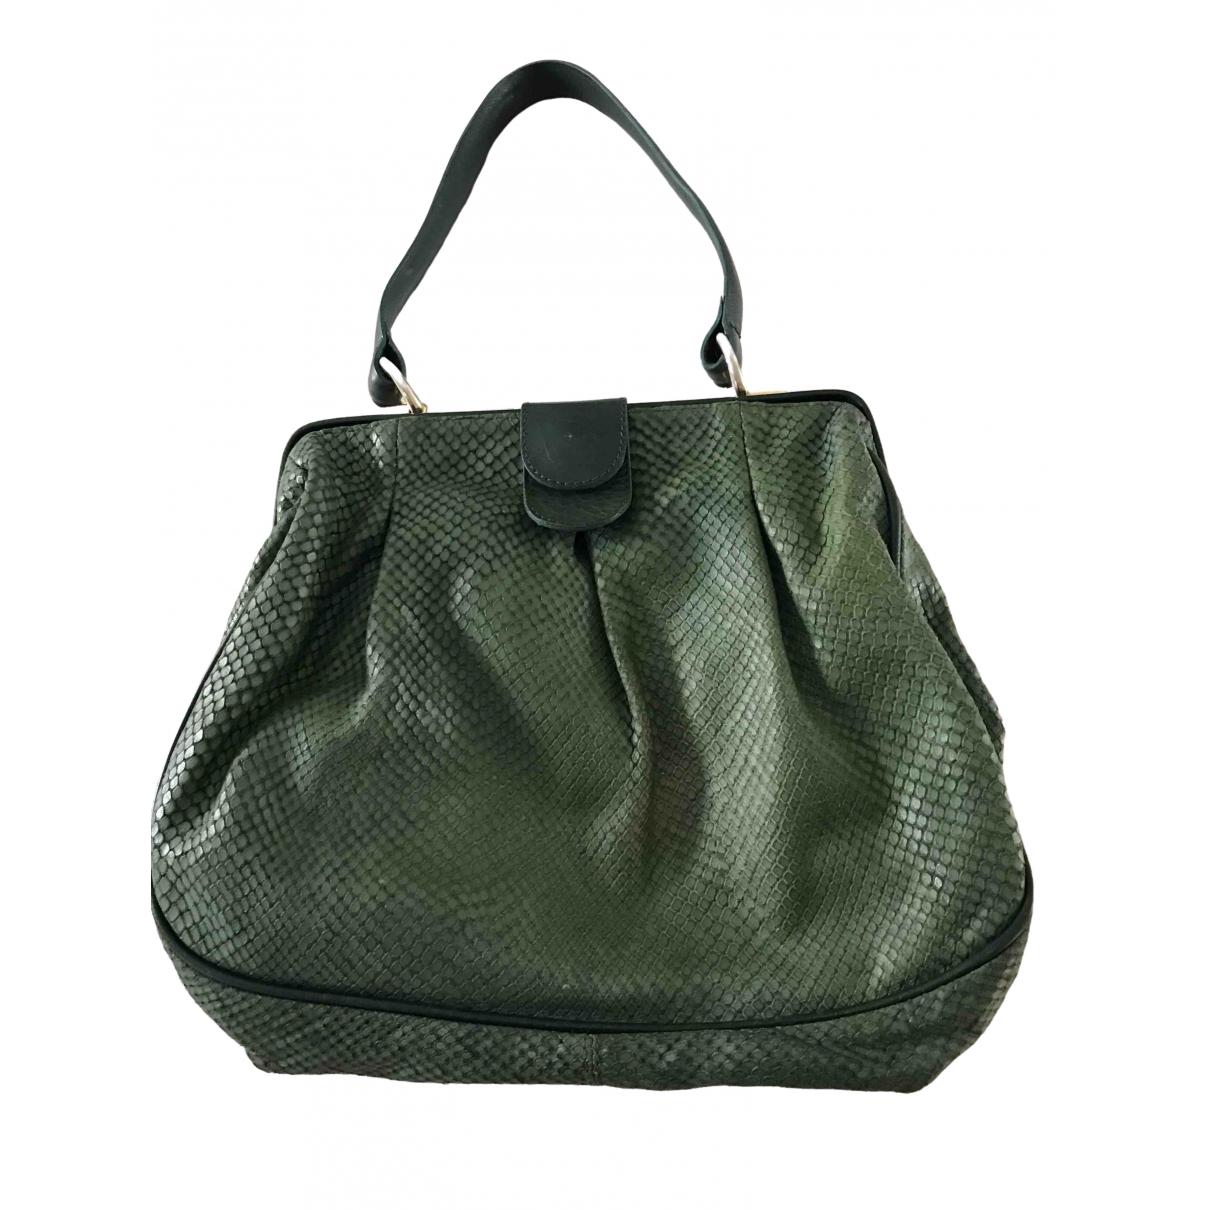 Schumacher \N Green Leather handbag for Women \N